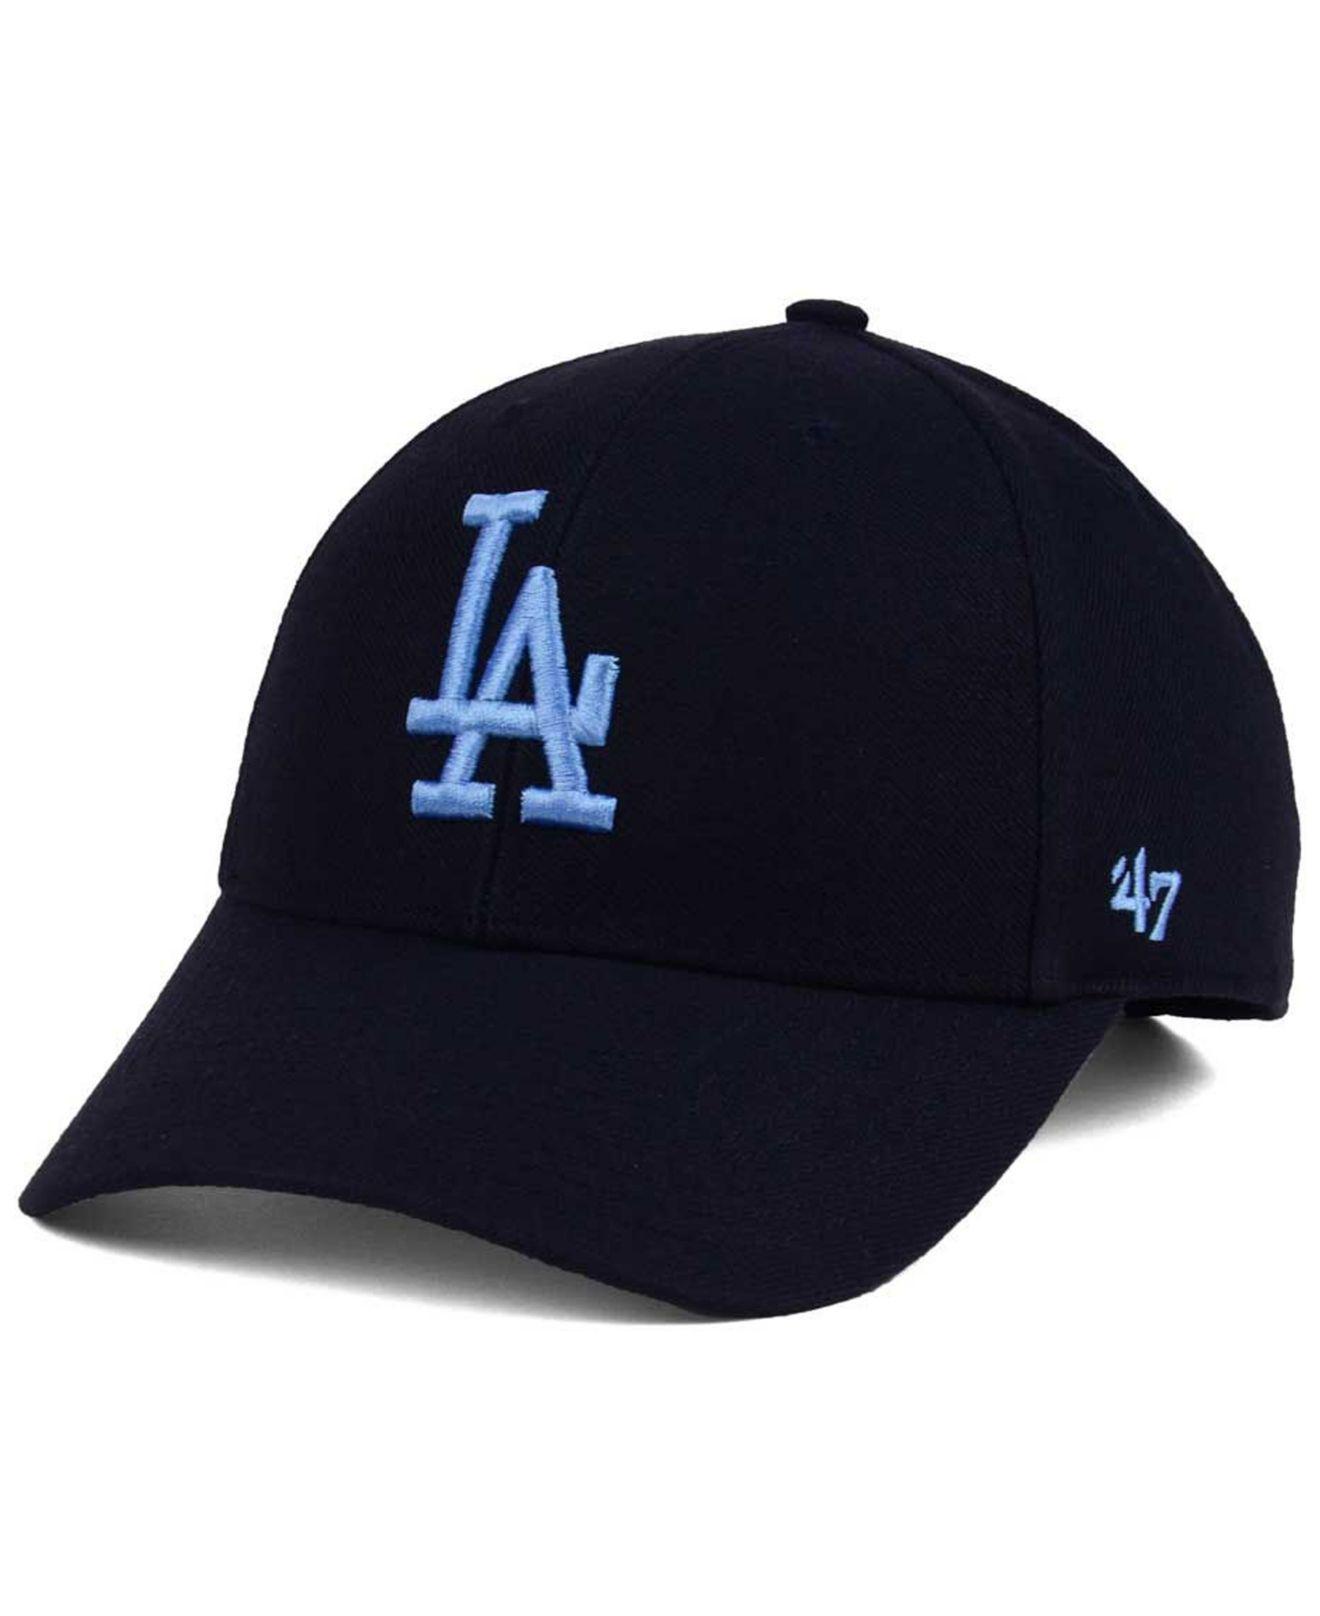 factory price 3ede6 8d46d ... Los Angeles Dodgers Mvp Cap for Men - Lyst. View fullscreen